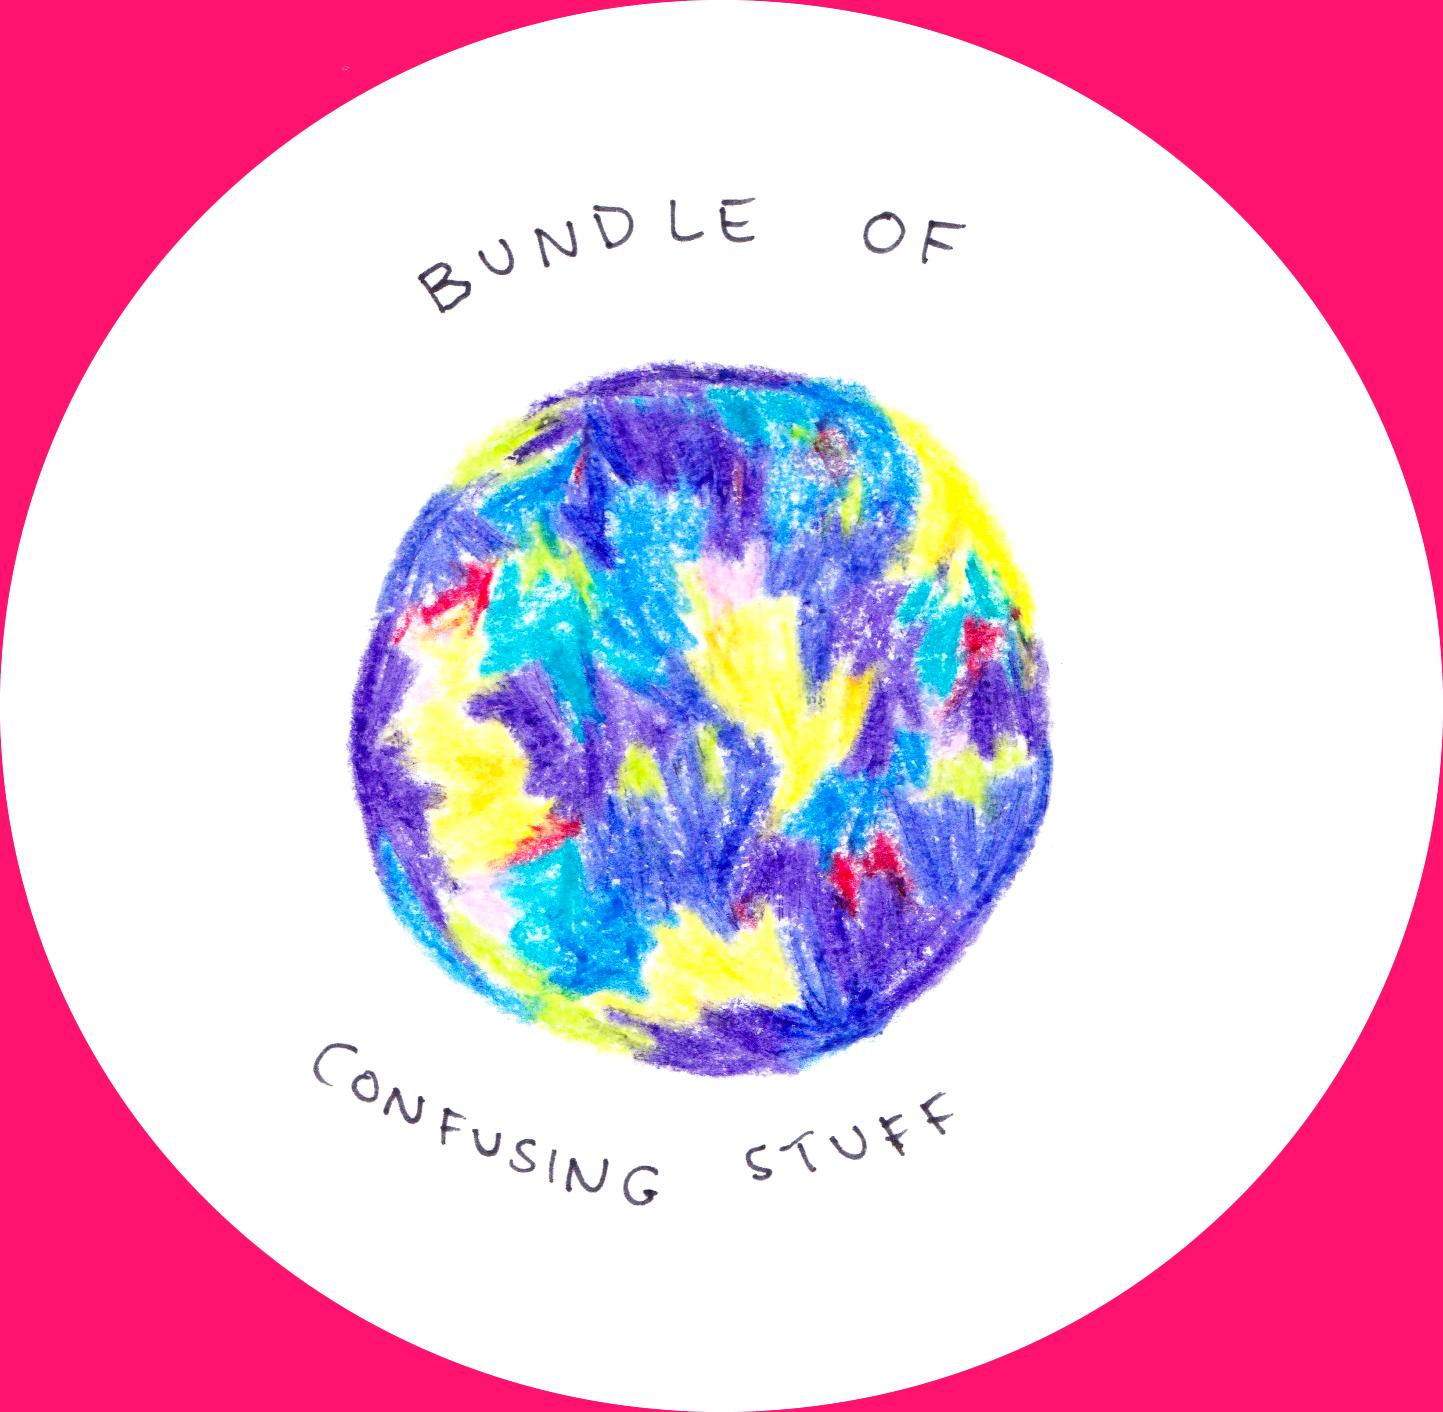 Bundle of Confusing Stuff